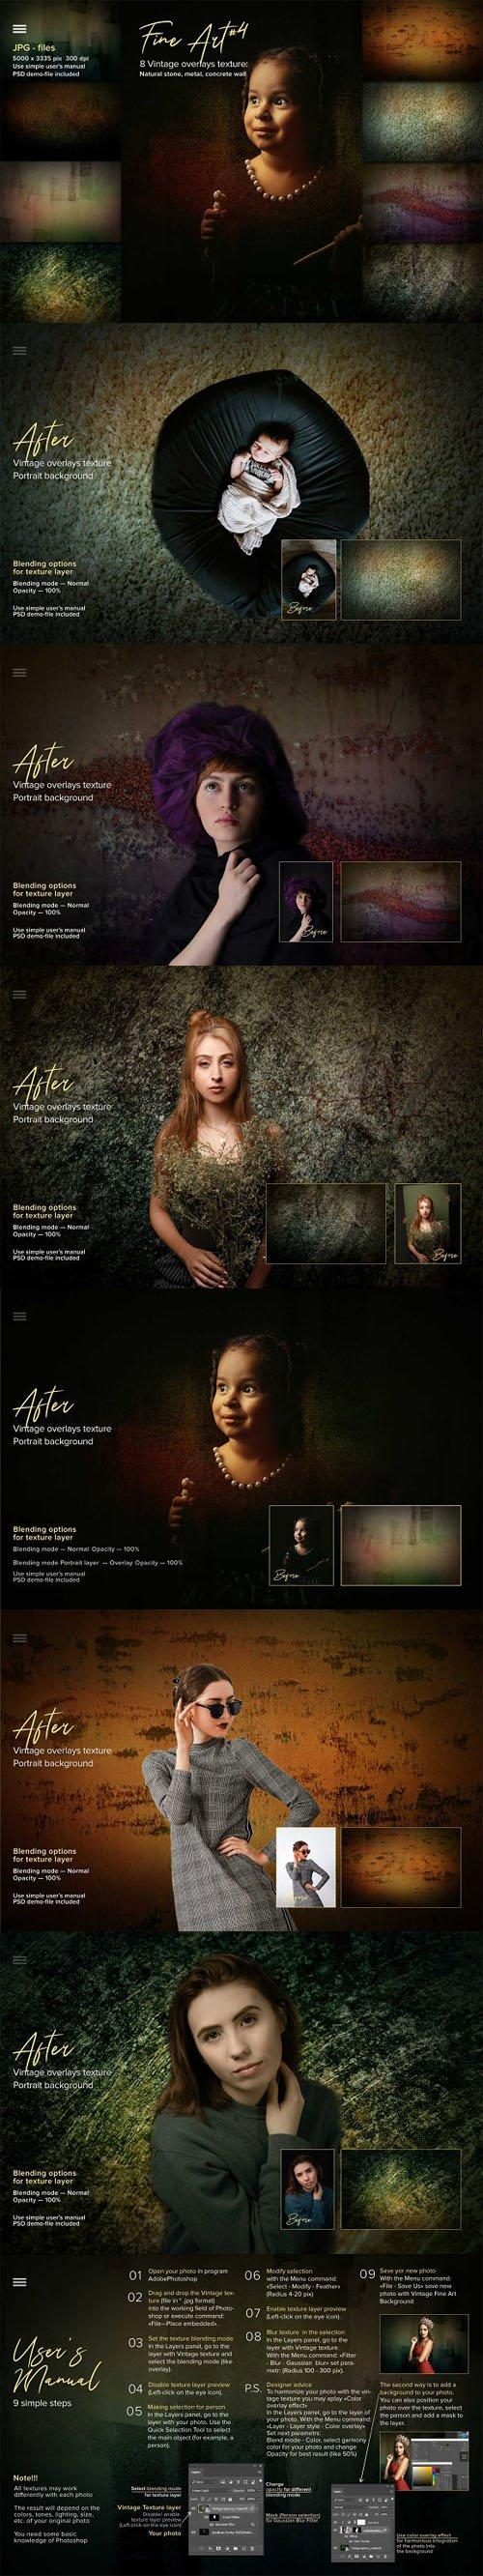 Fine Art Vintage Overlays & Portrait Textures Vol.4